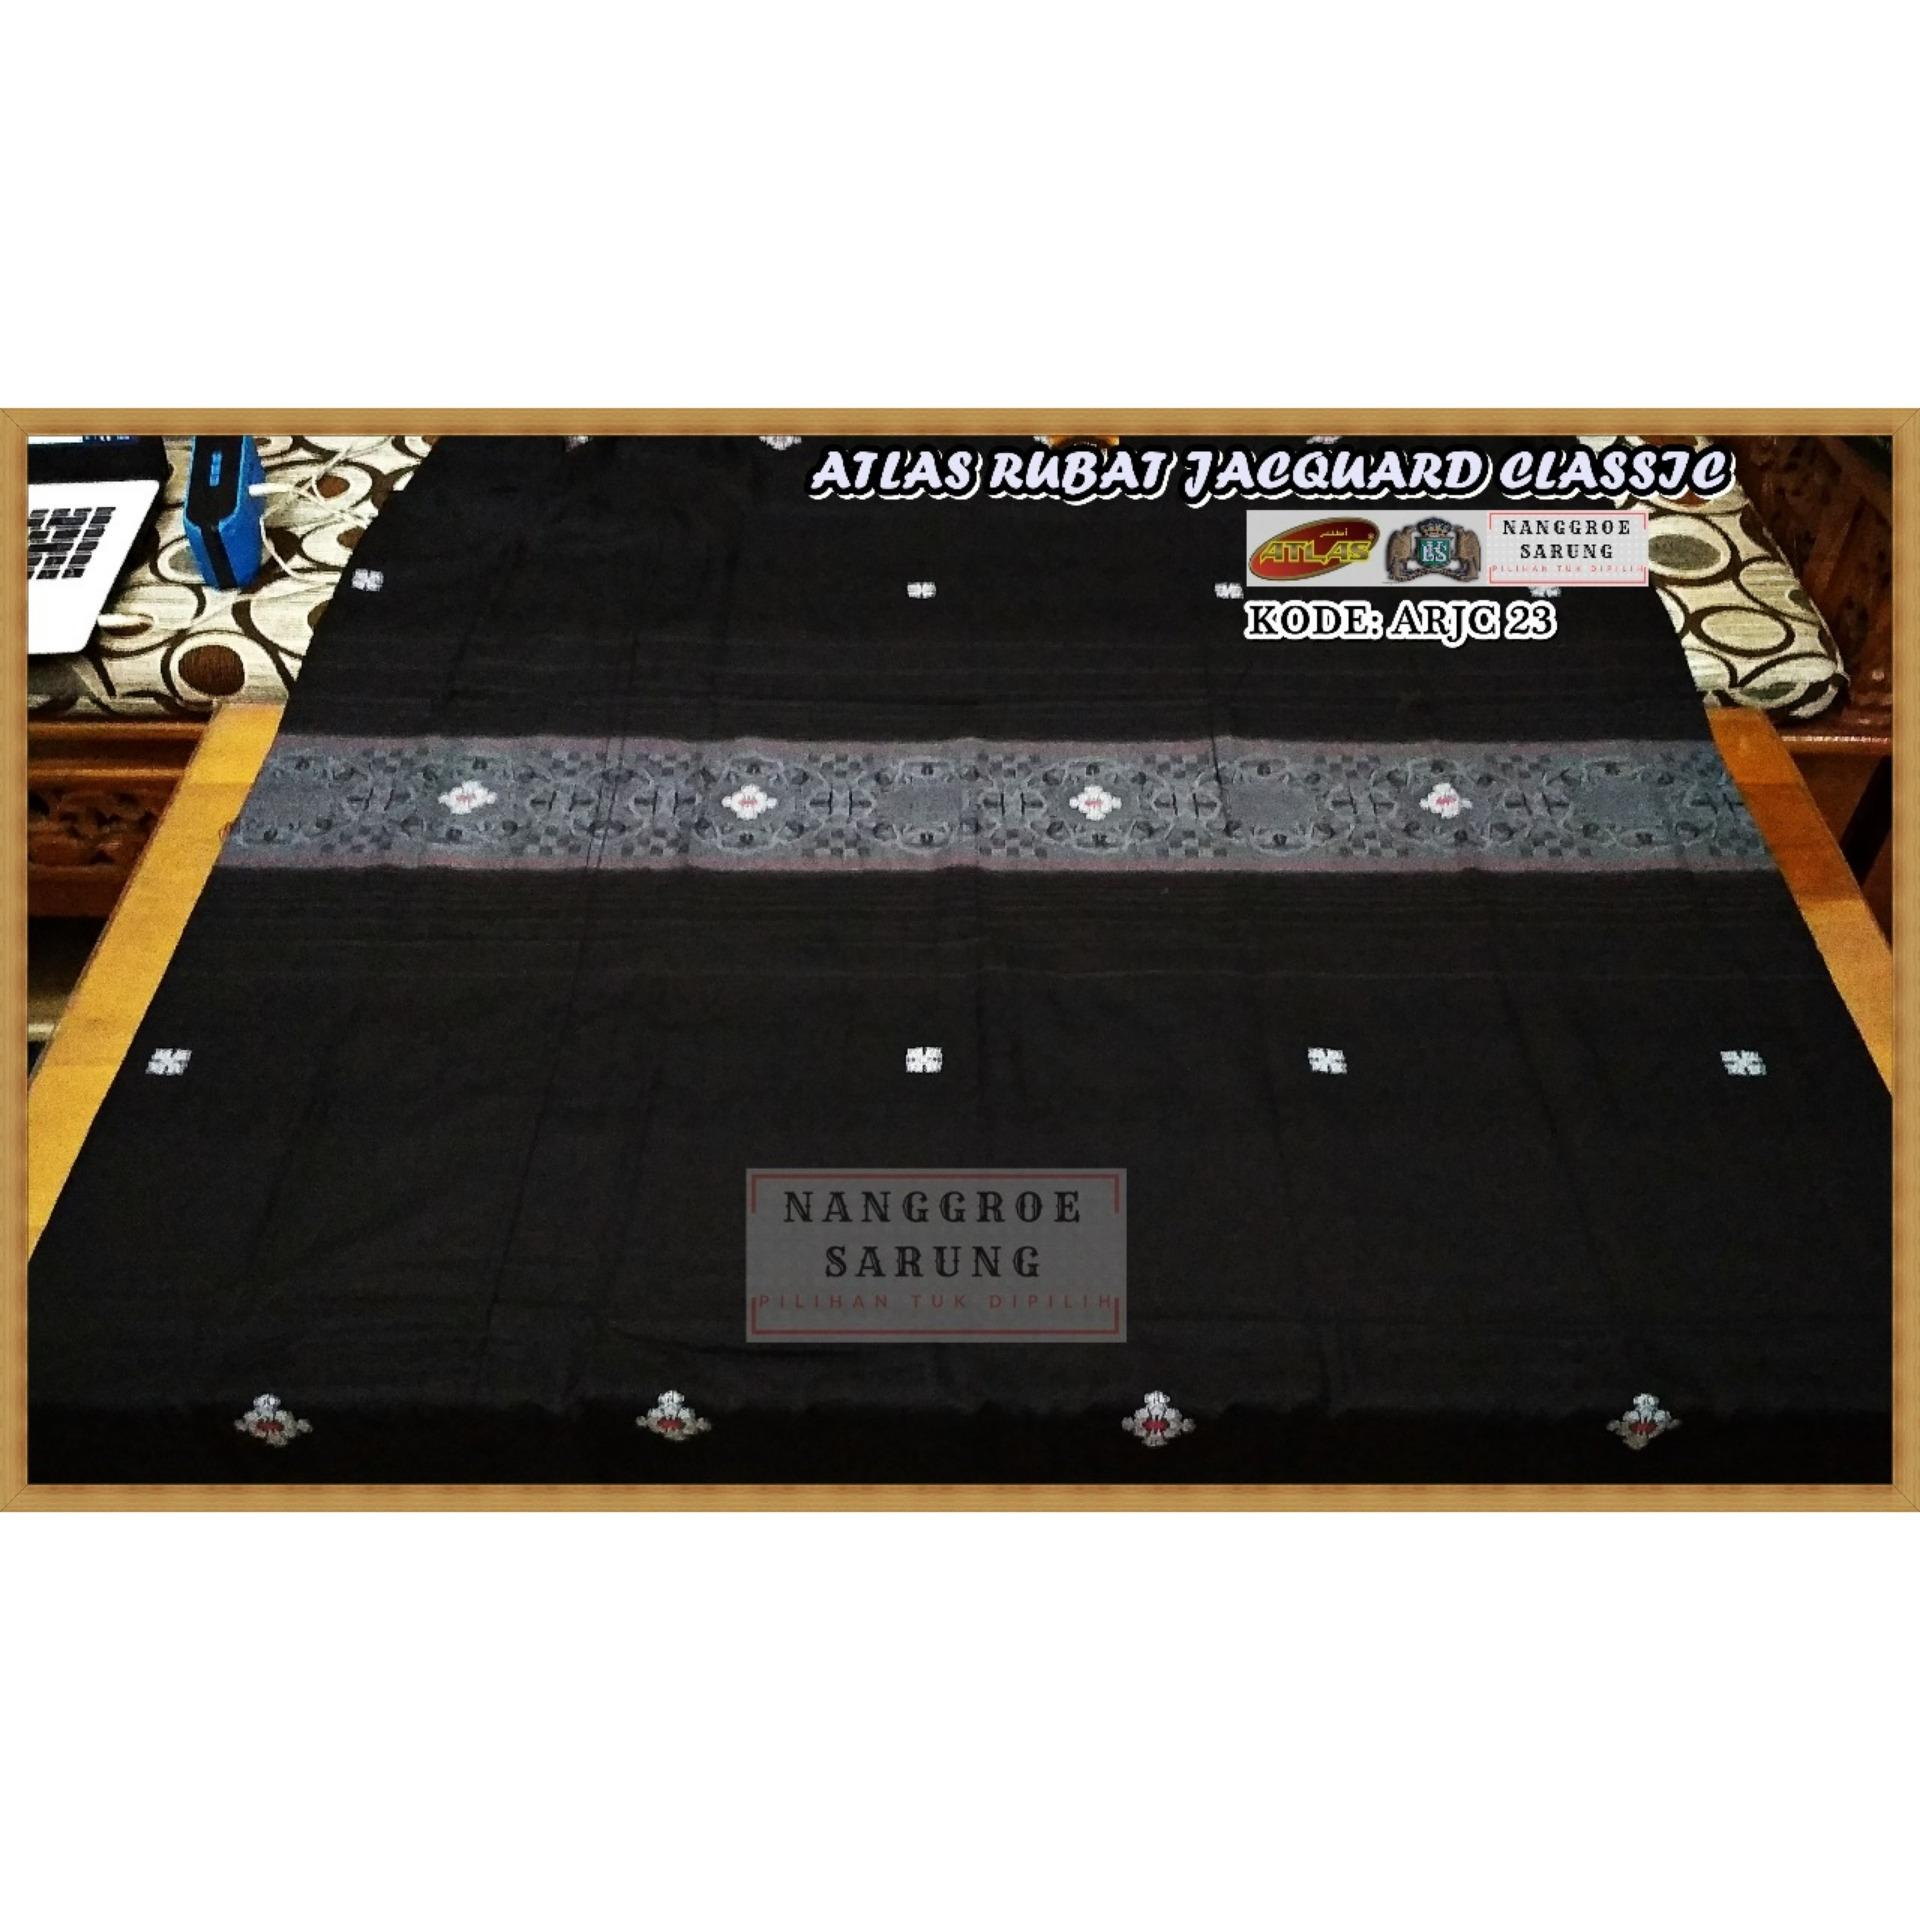 Sarung Atlas Rubat Motif Jacquard Classic 23